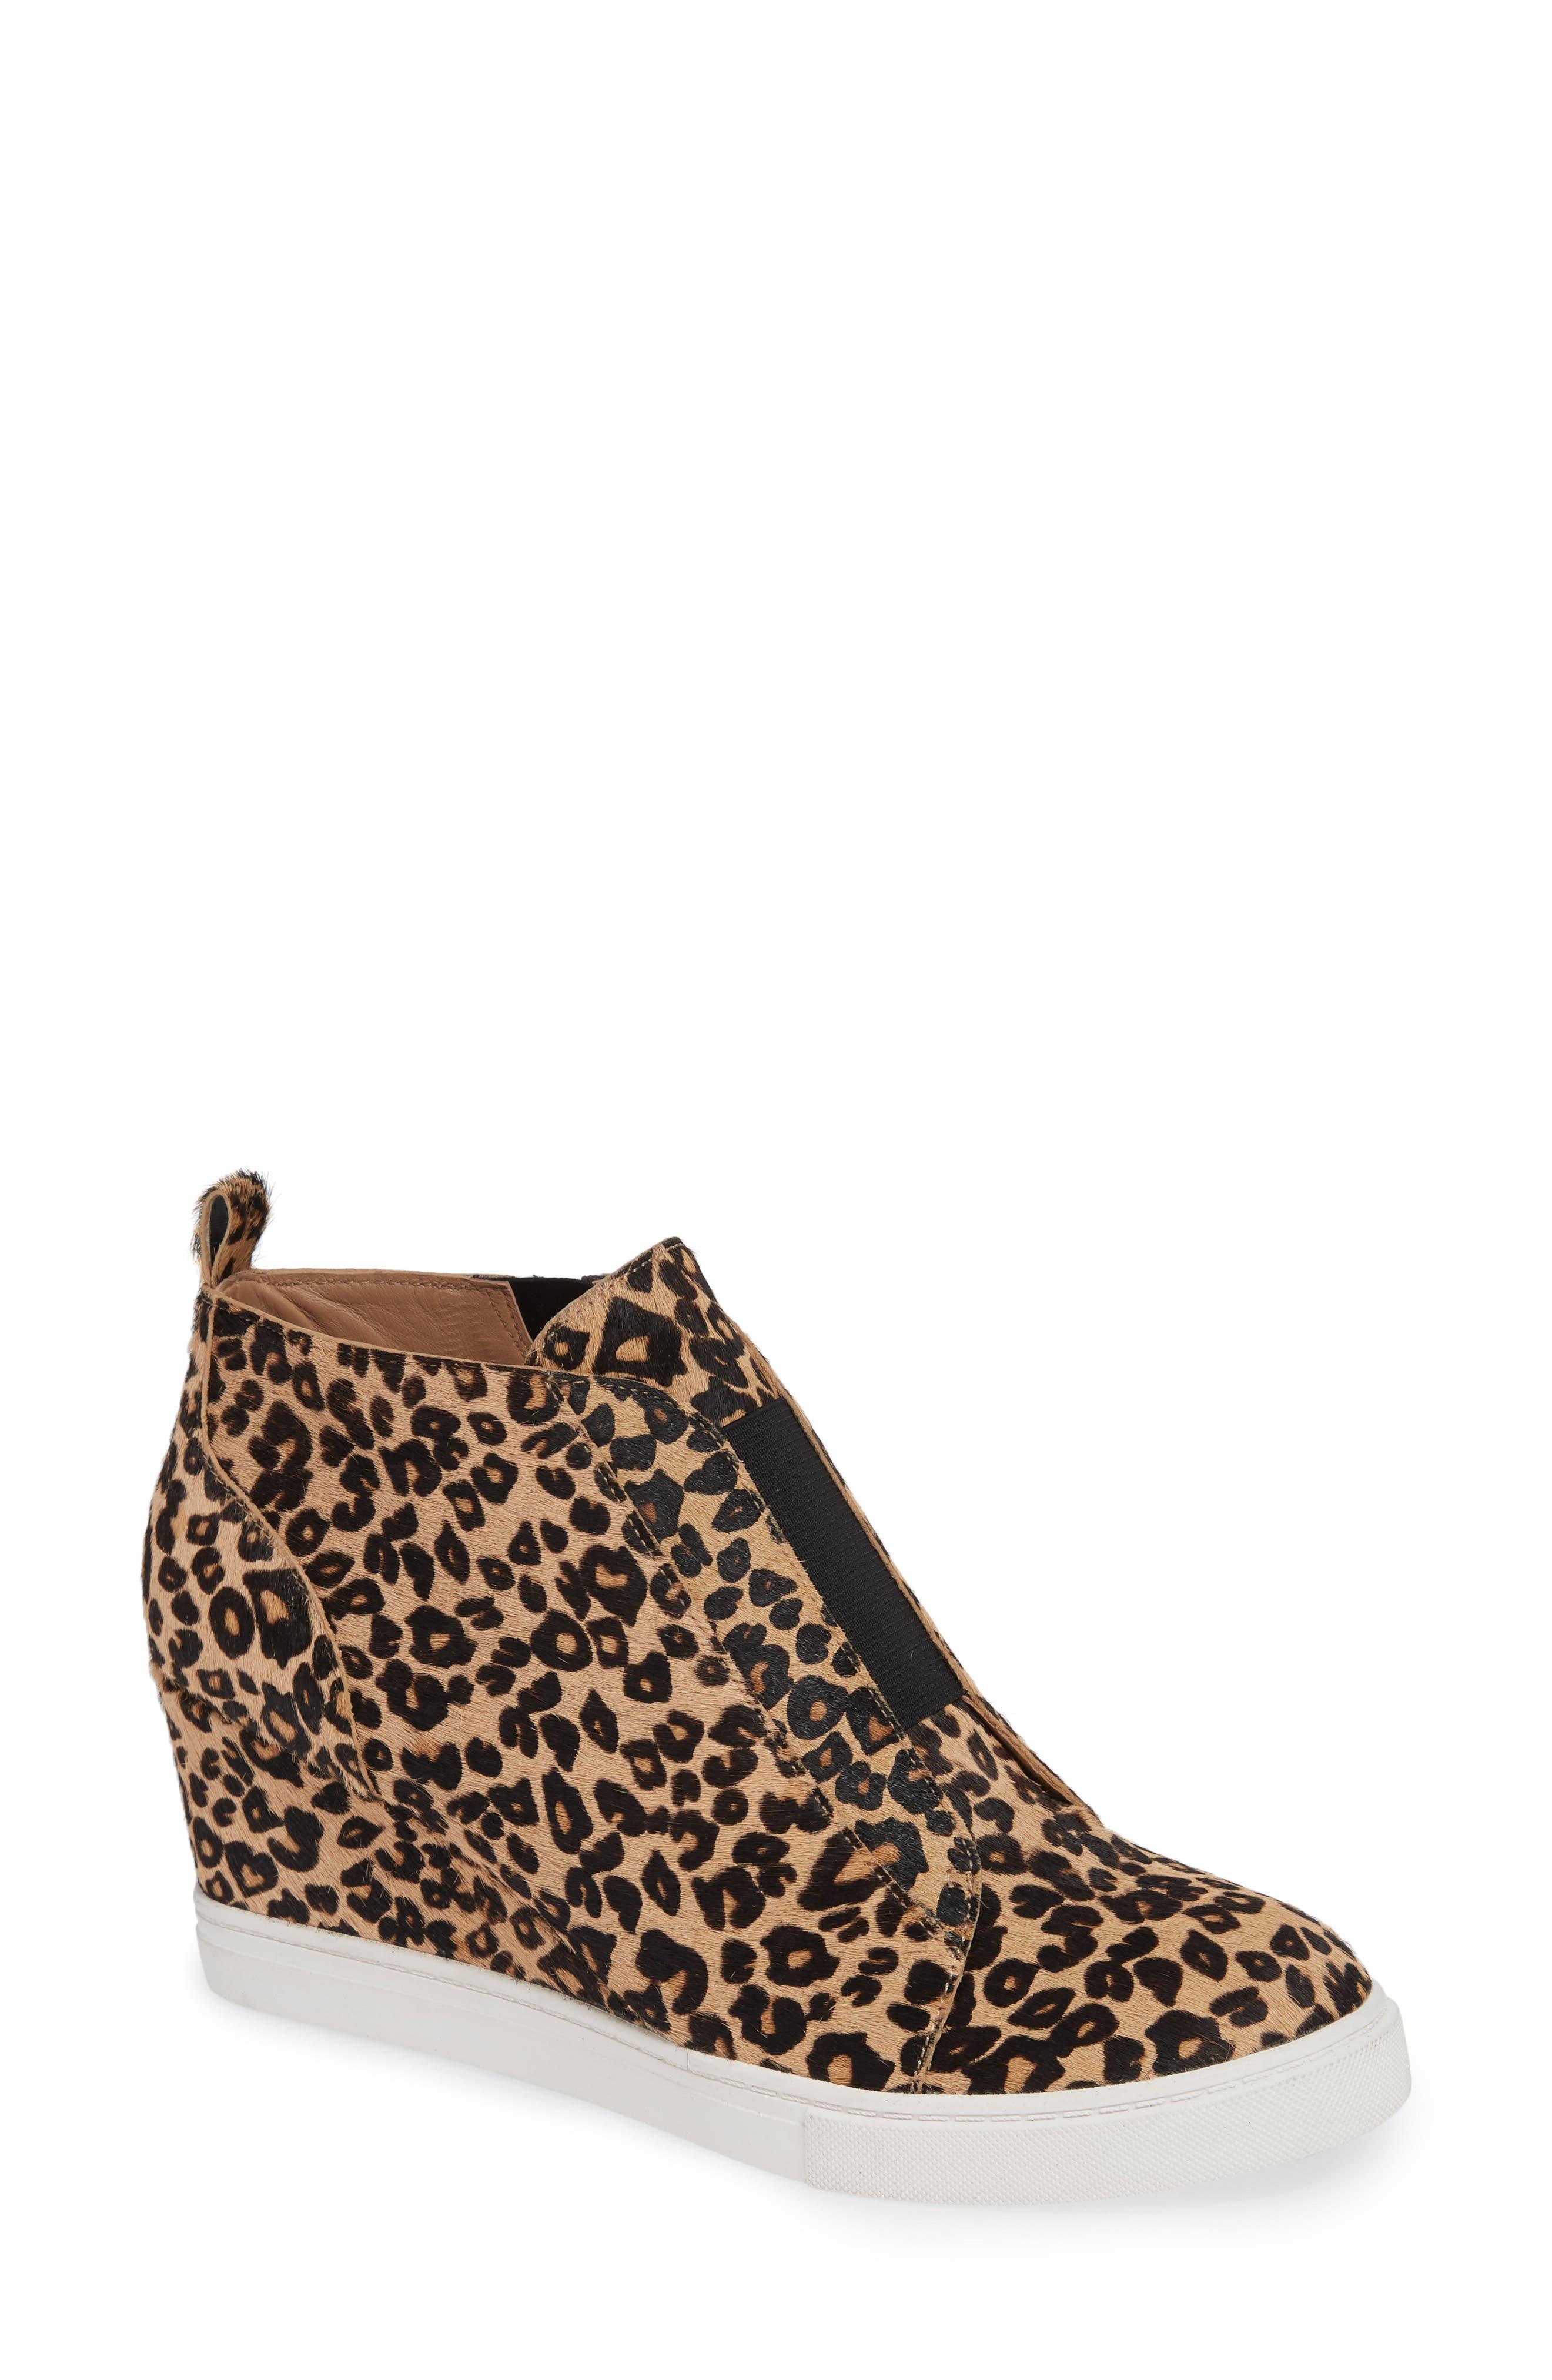 Felicia III Genuine Calf Hair Wedge Sneaker,                         Main,                         color, LEOPARD PRINT HAIR CALF